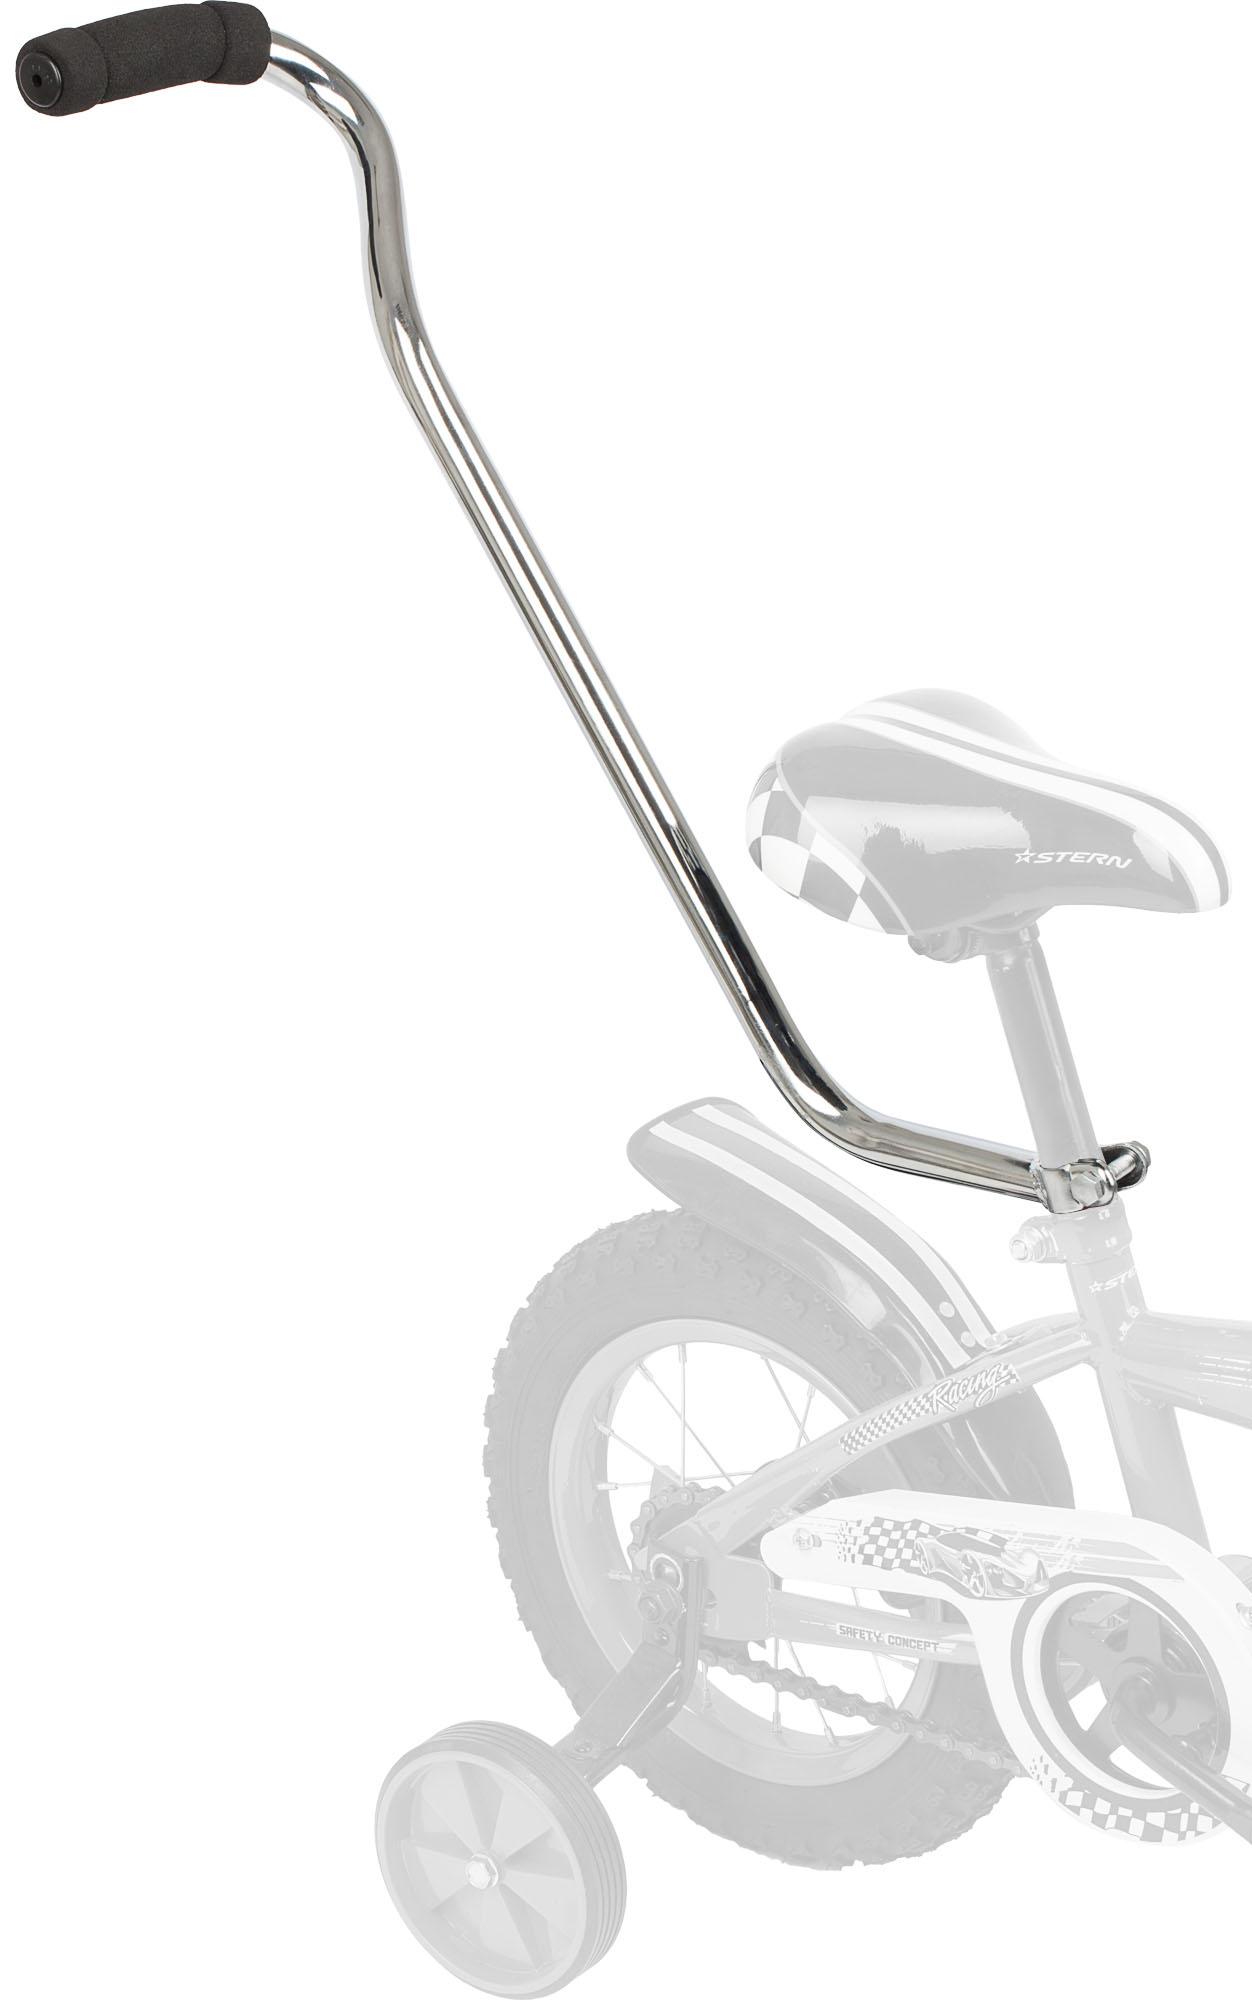 Stern Рукоятка для детского велосипеда Stern, размер Без размера